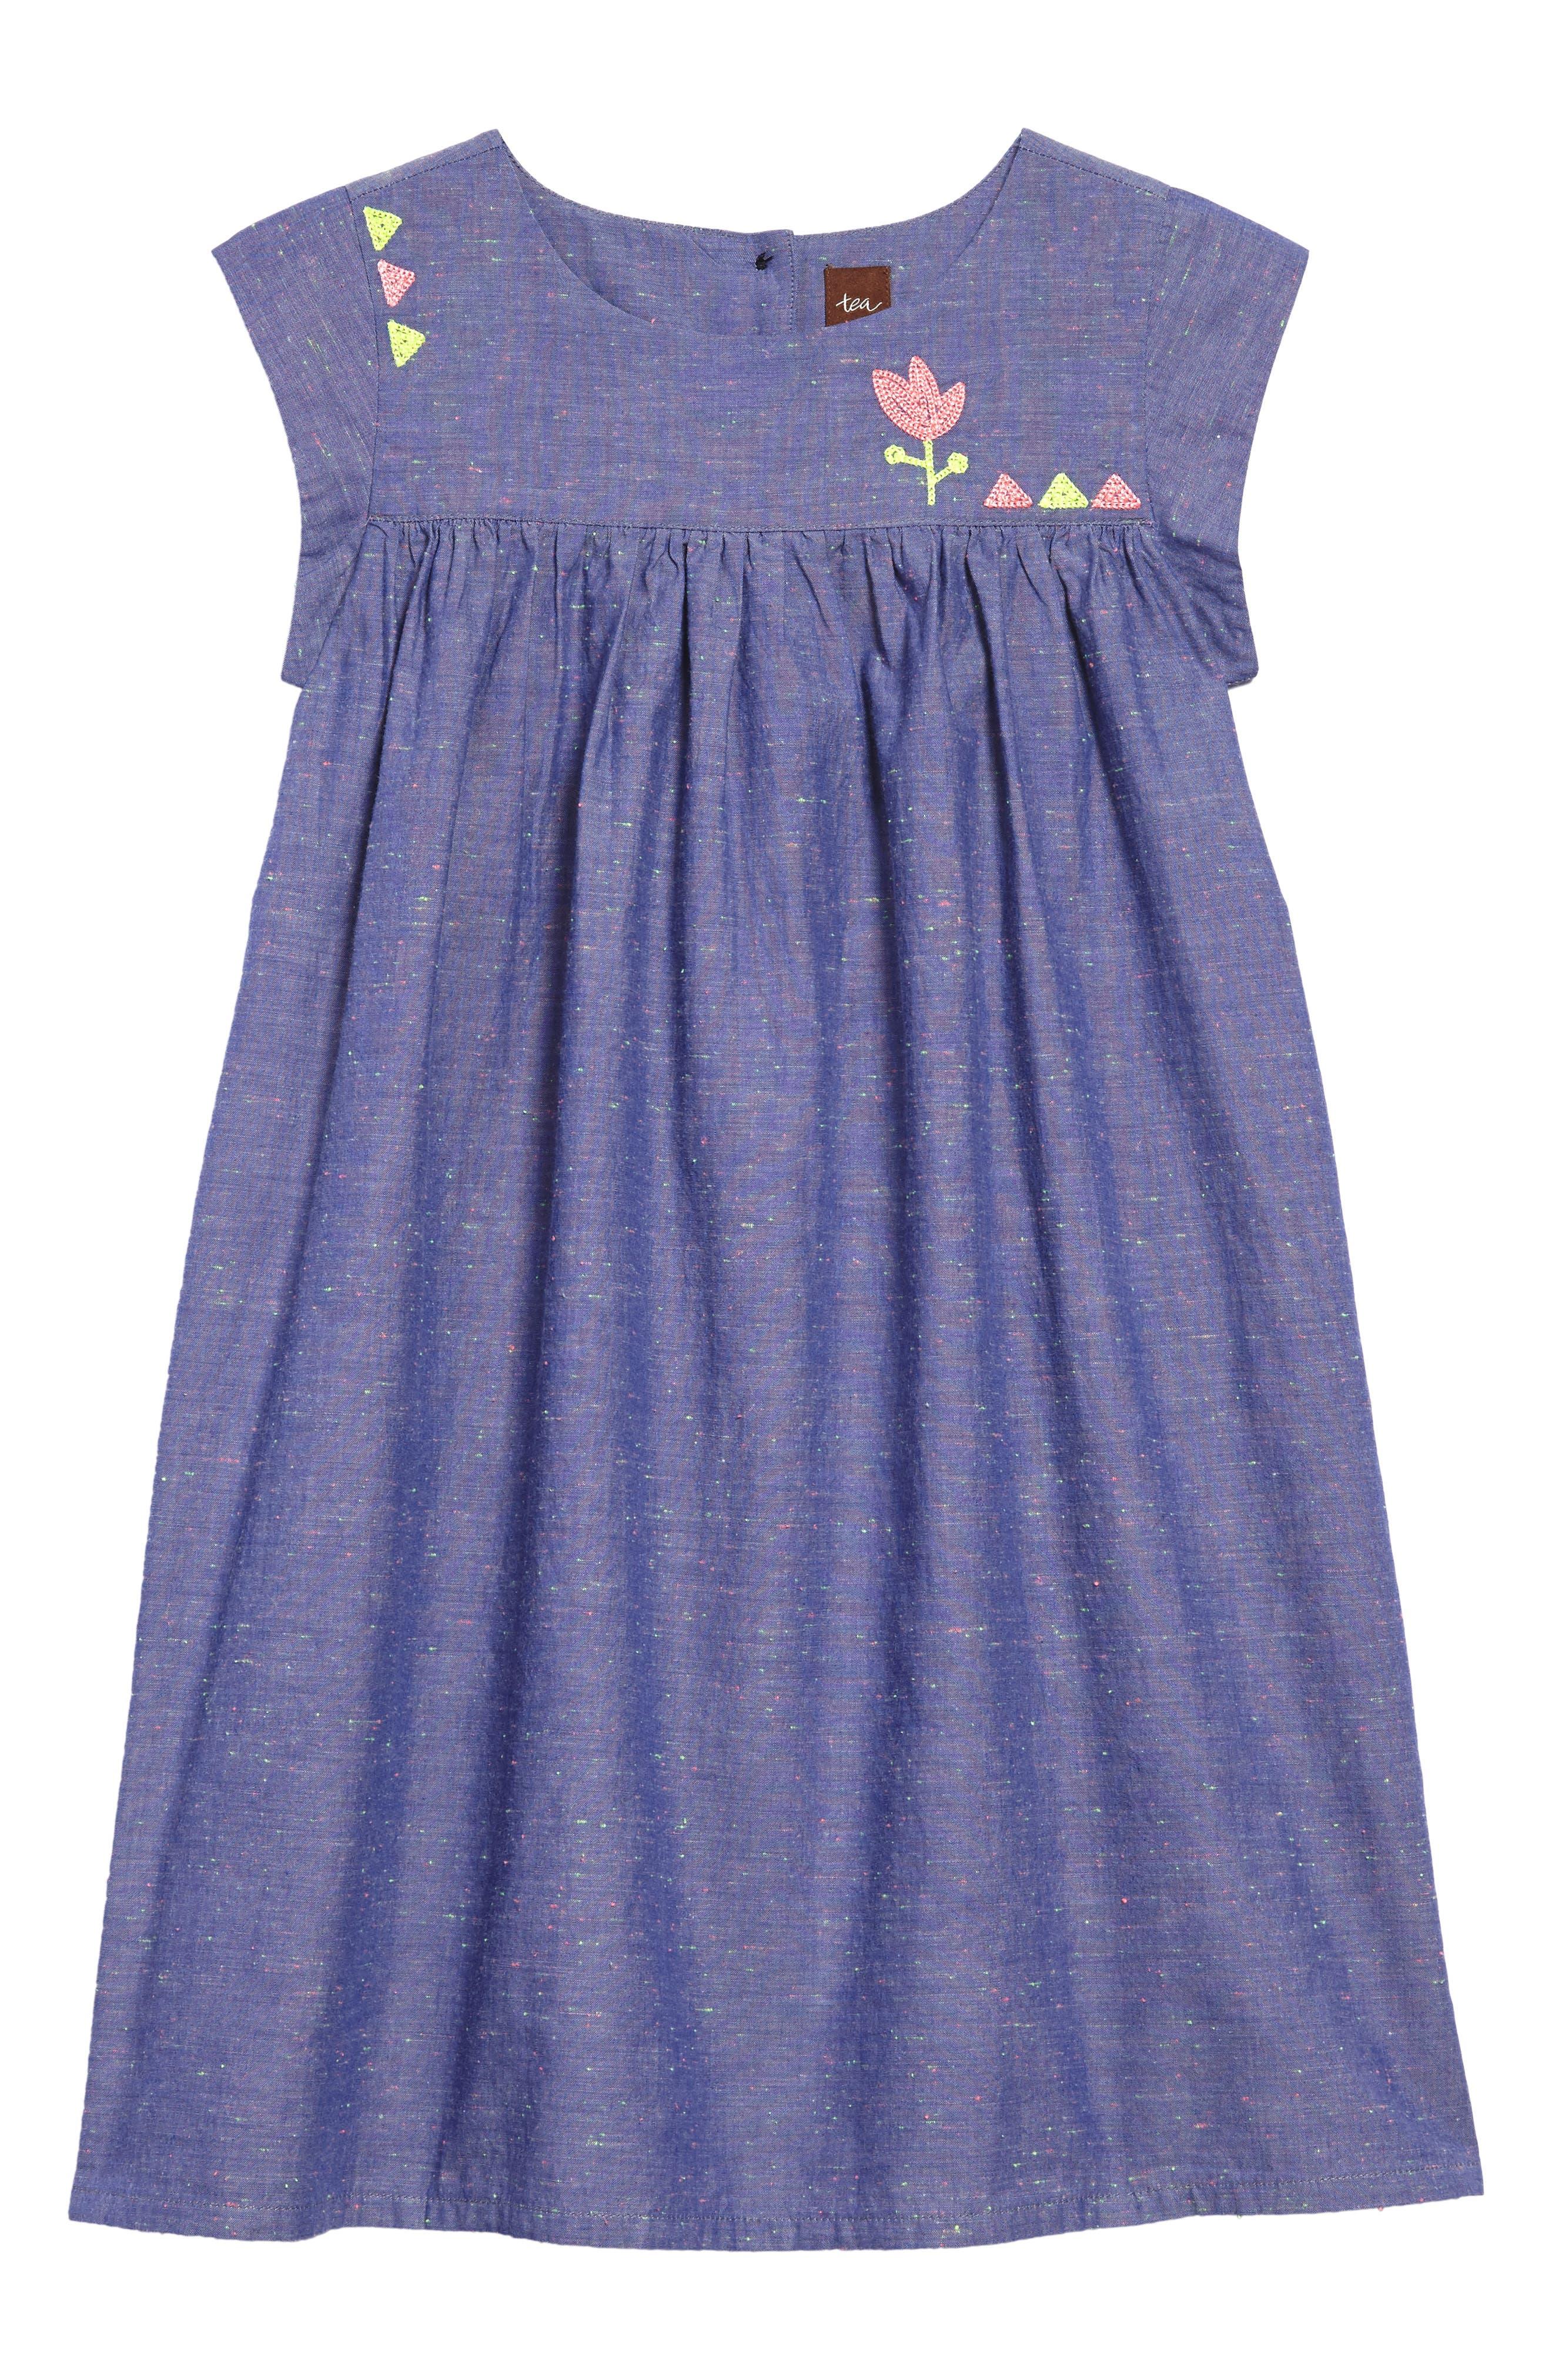 Nep Chambray Dress,                         Main,                         color,